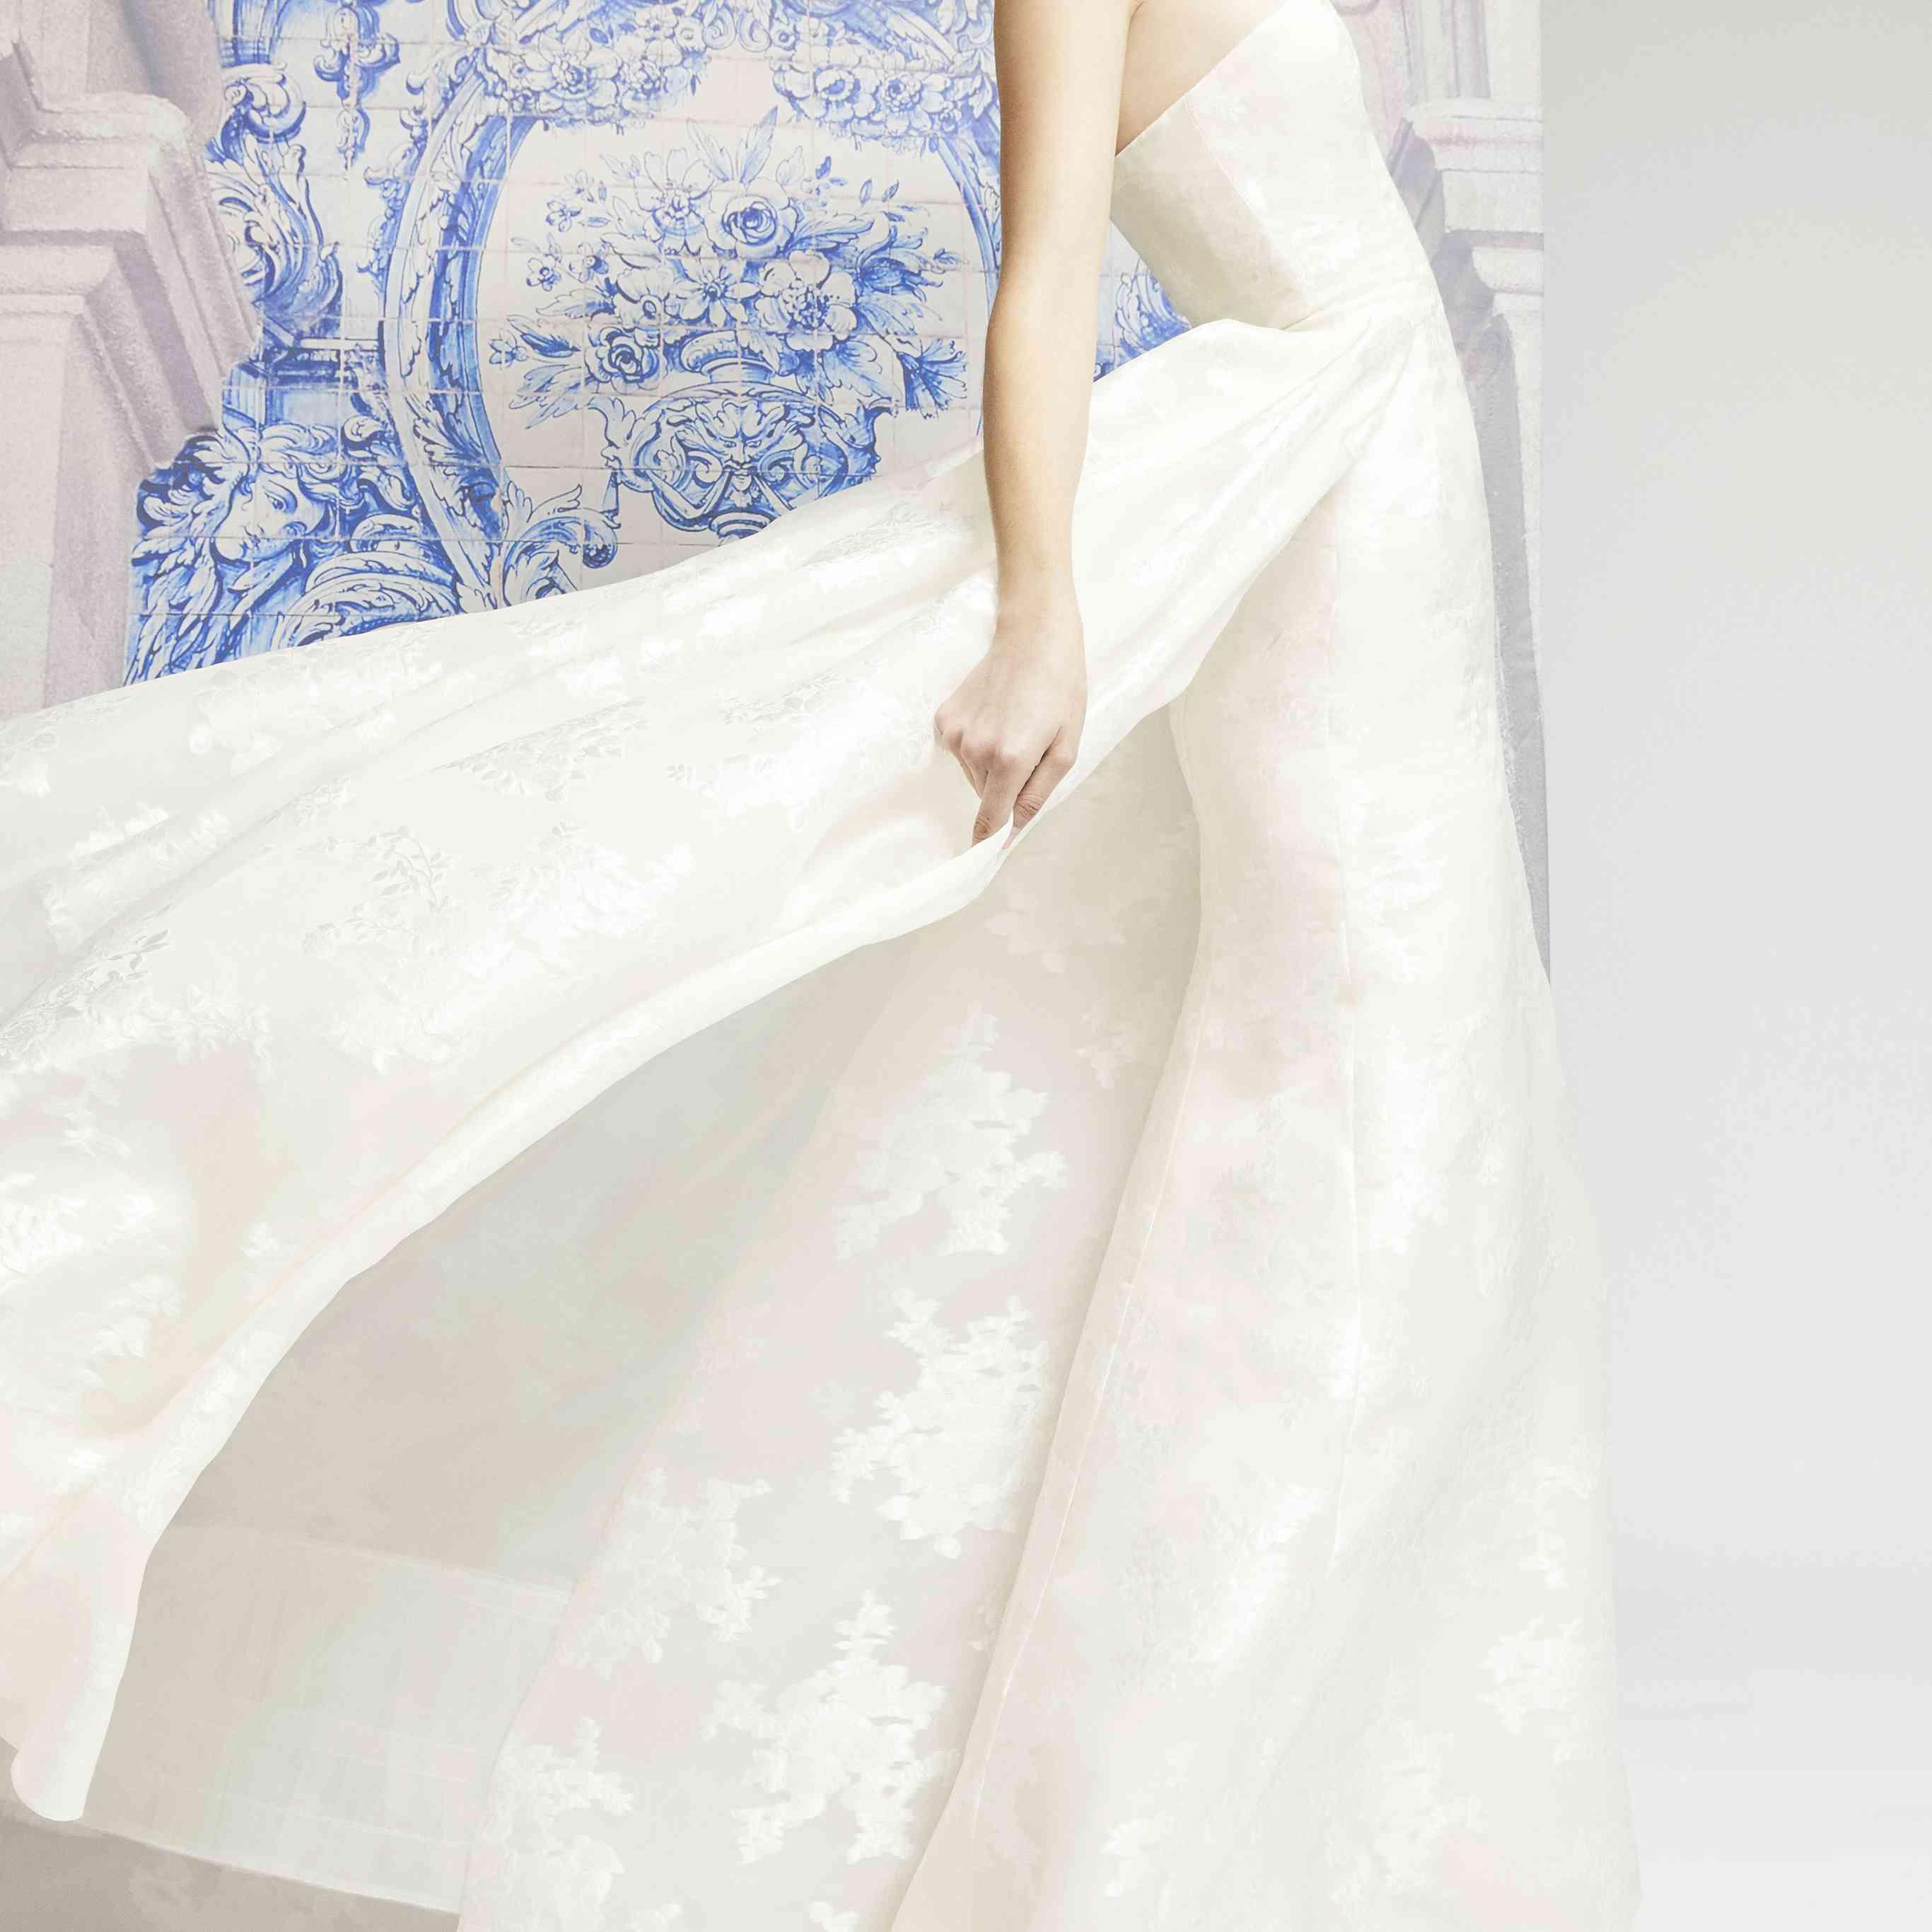 Carolina Herrera Wedding Dress.Carolina Herrera Bridal Fall 2019